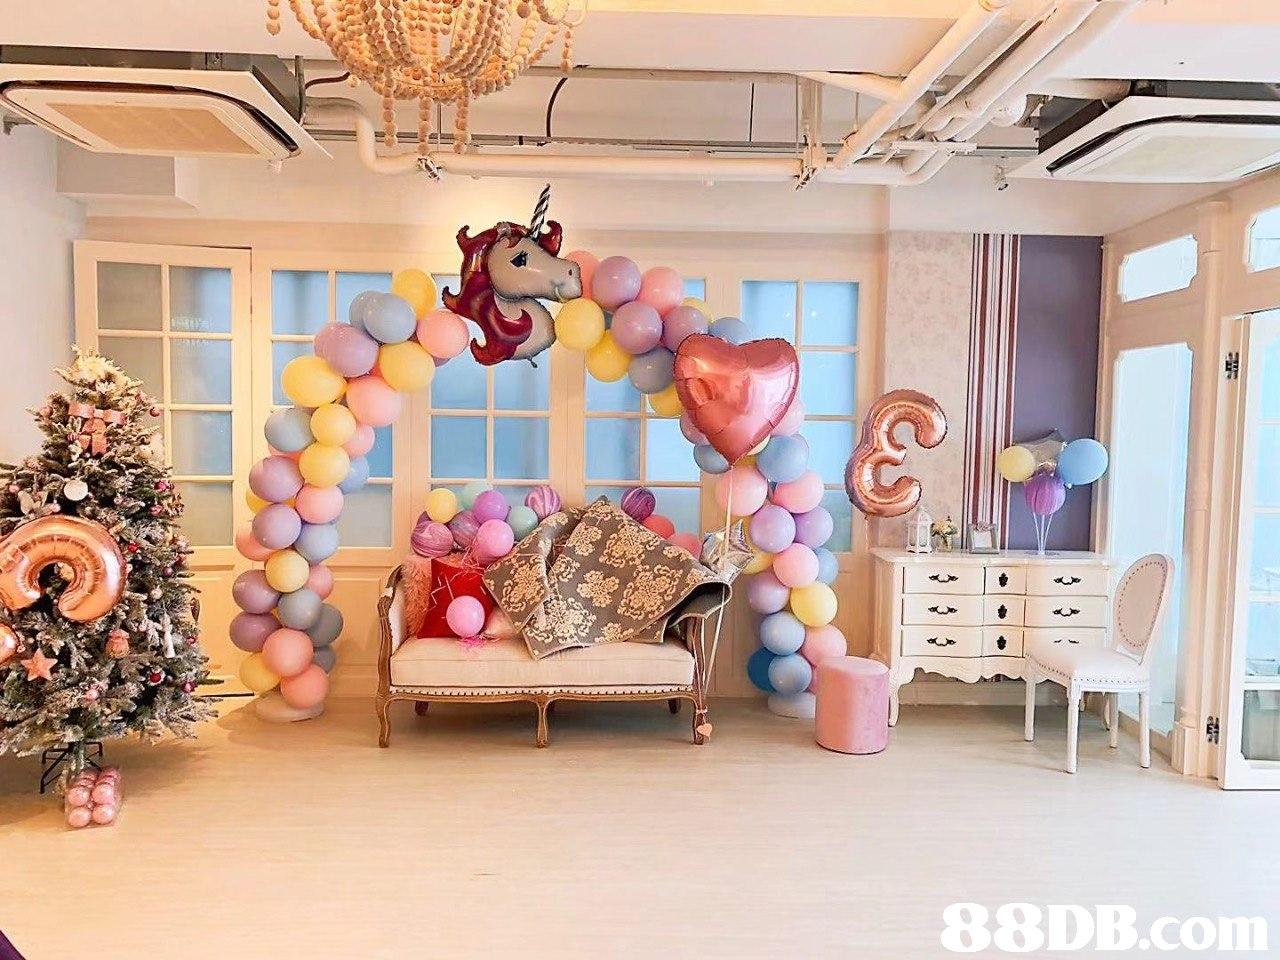 room,balloon,interior design,toy,home